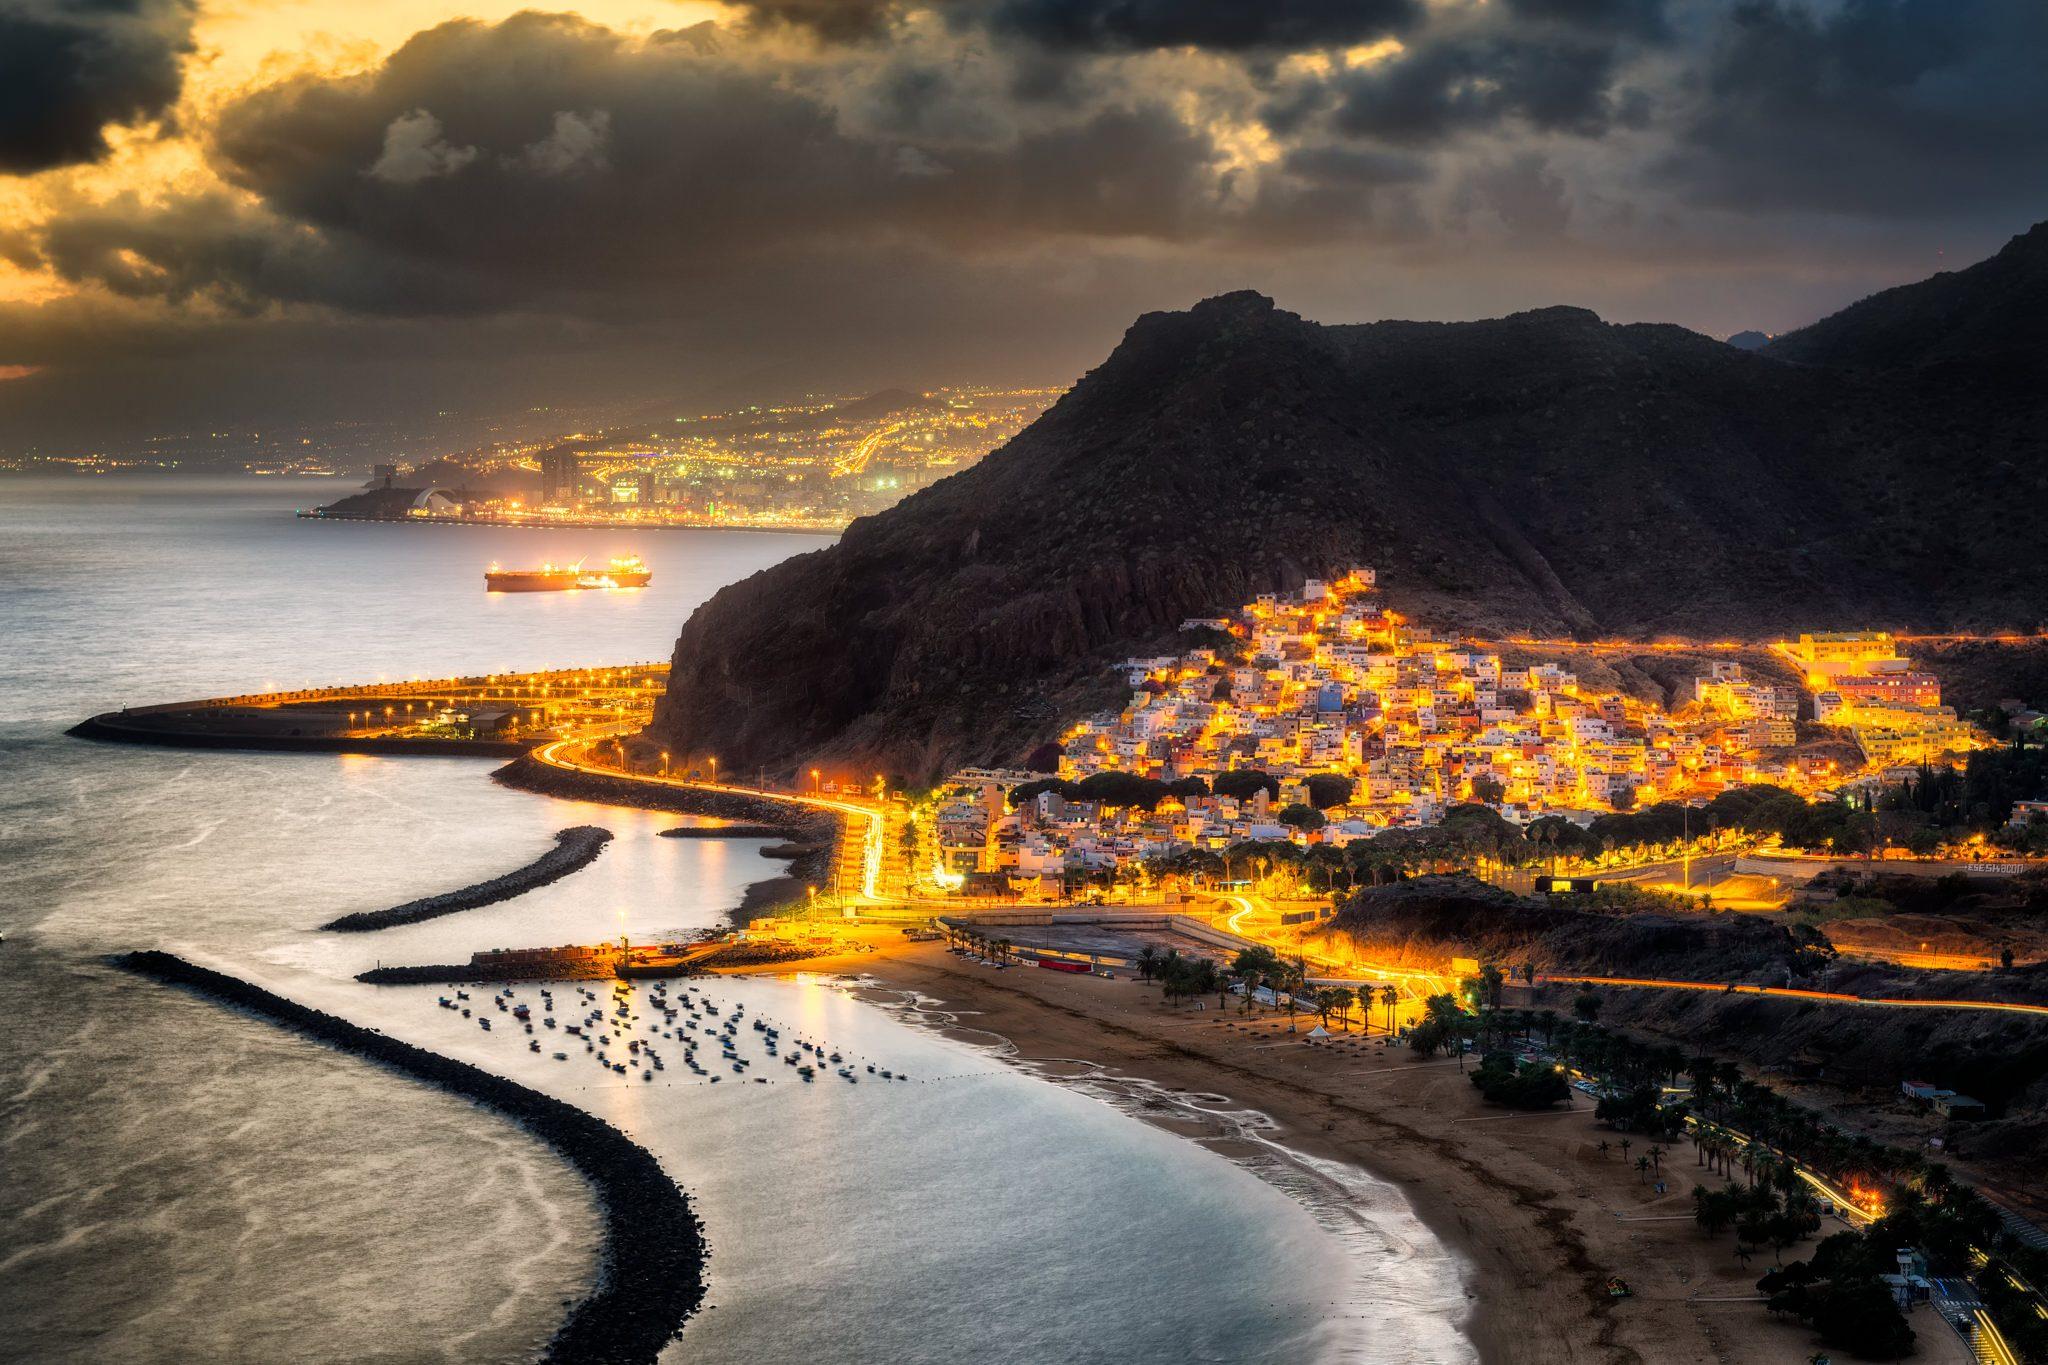 Sunset over Las Teresitas and Anaga Mountains on Tenerife, Spain.